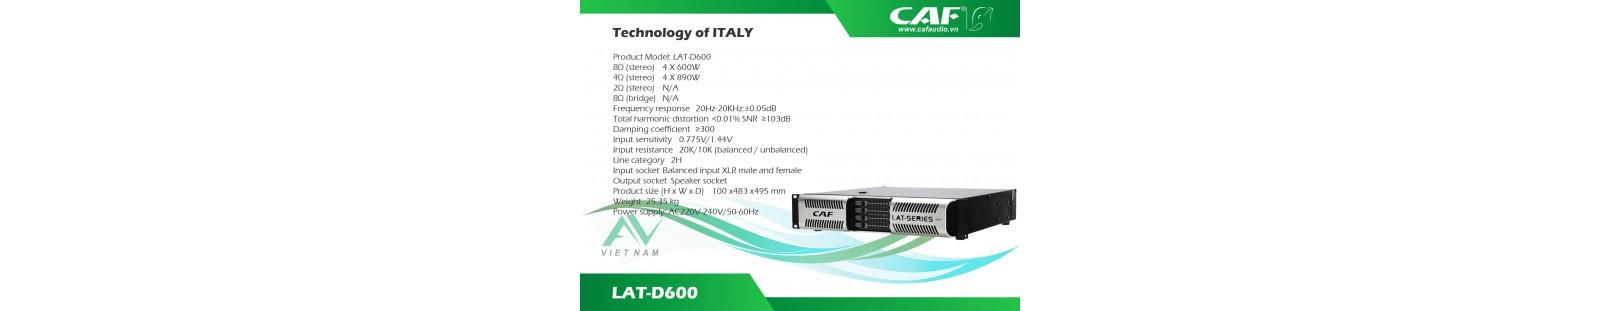 CAF LAT D600